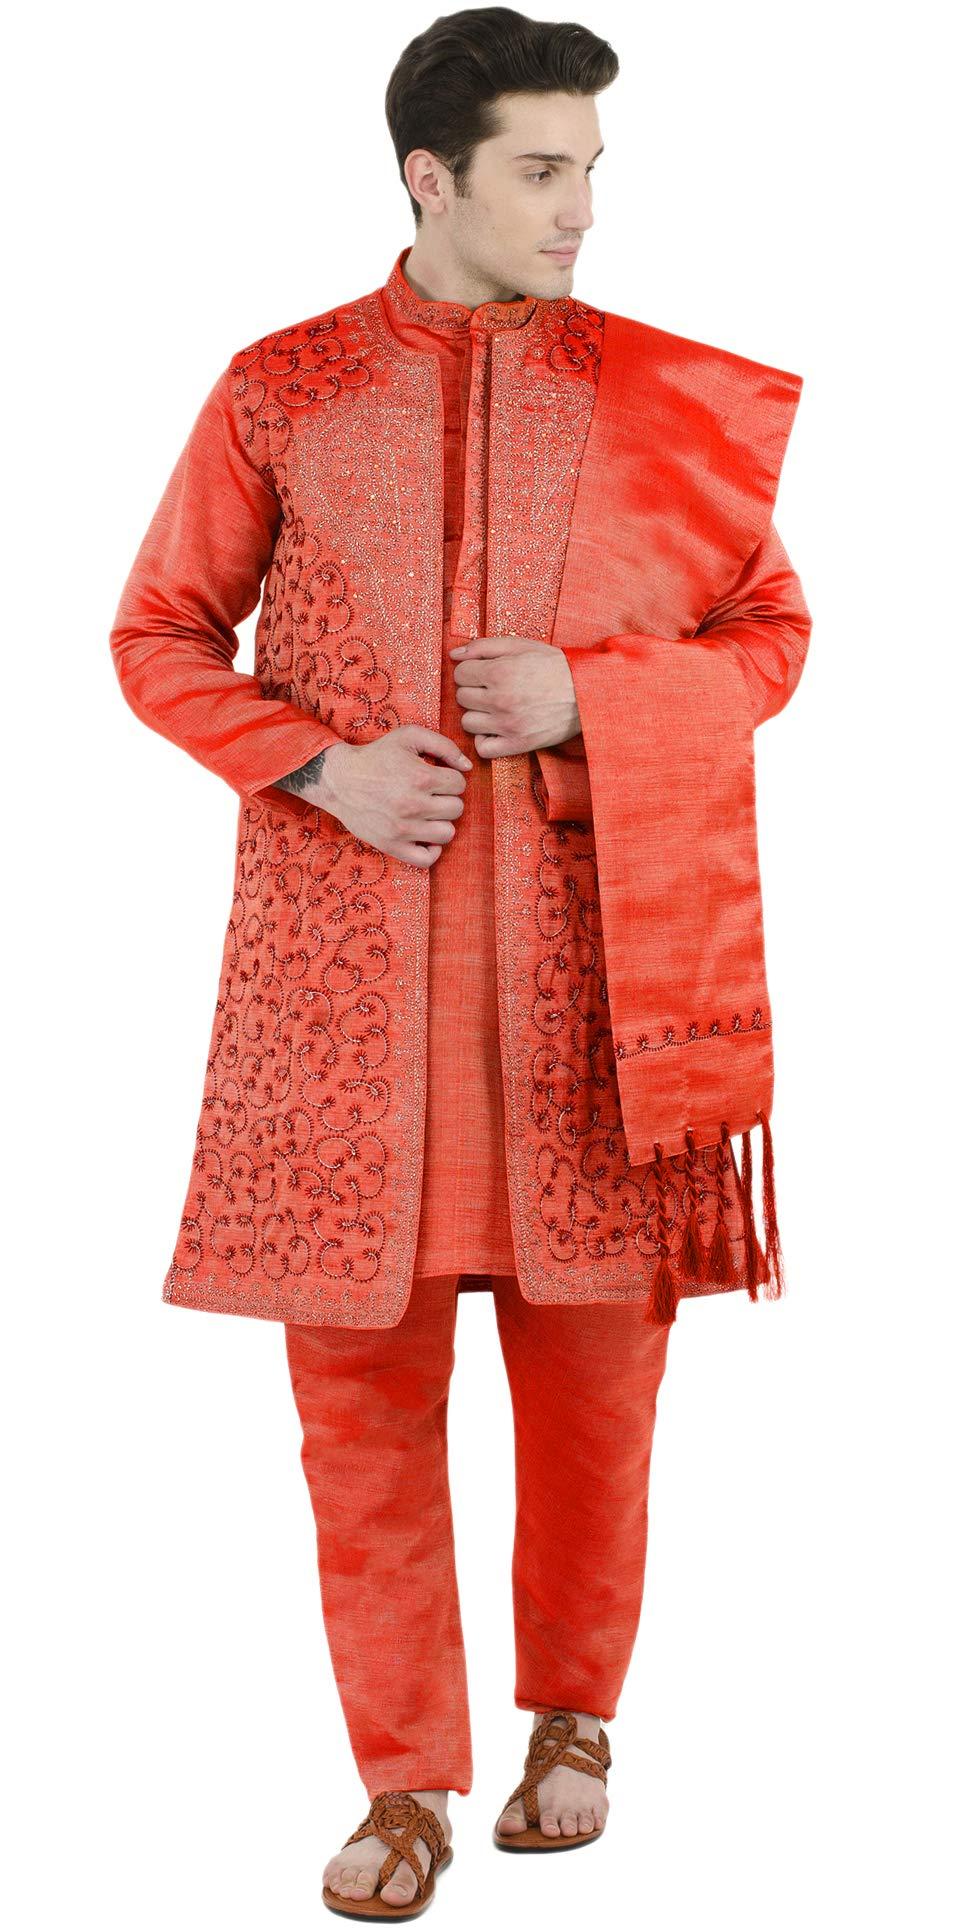 Wedding Kurta Pajama Sherwani 4-Pieces Set Men Indian Wear Long Sleeve Button Down Shirt Party Dress -L